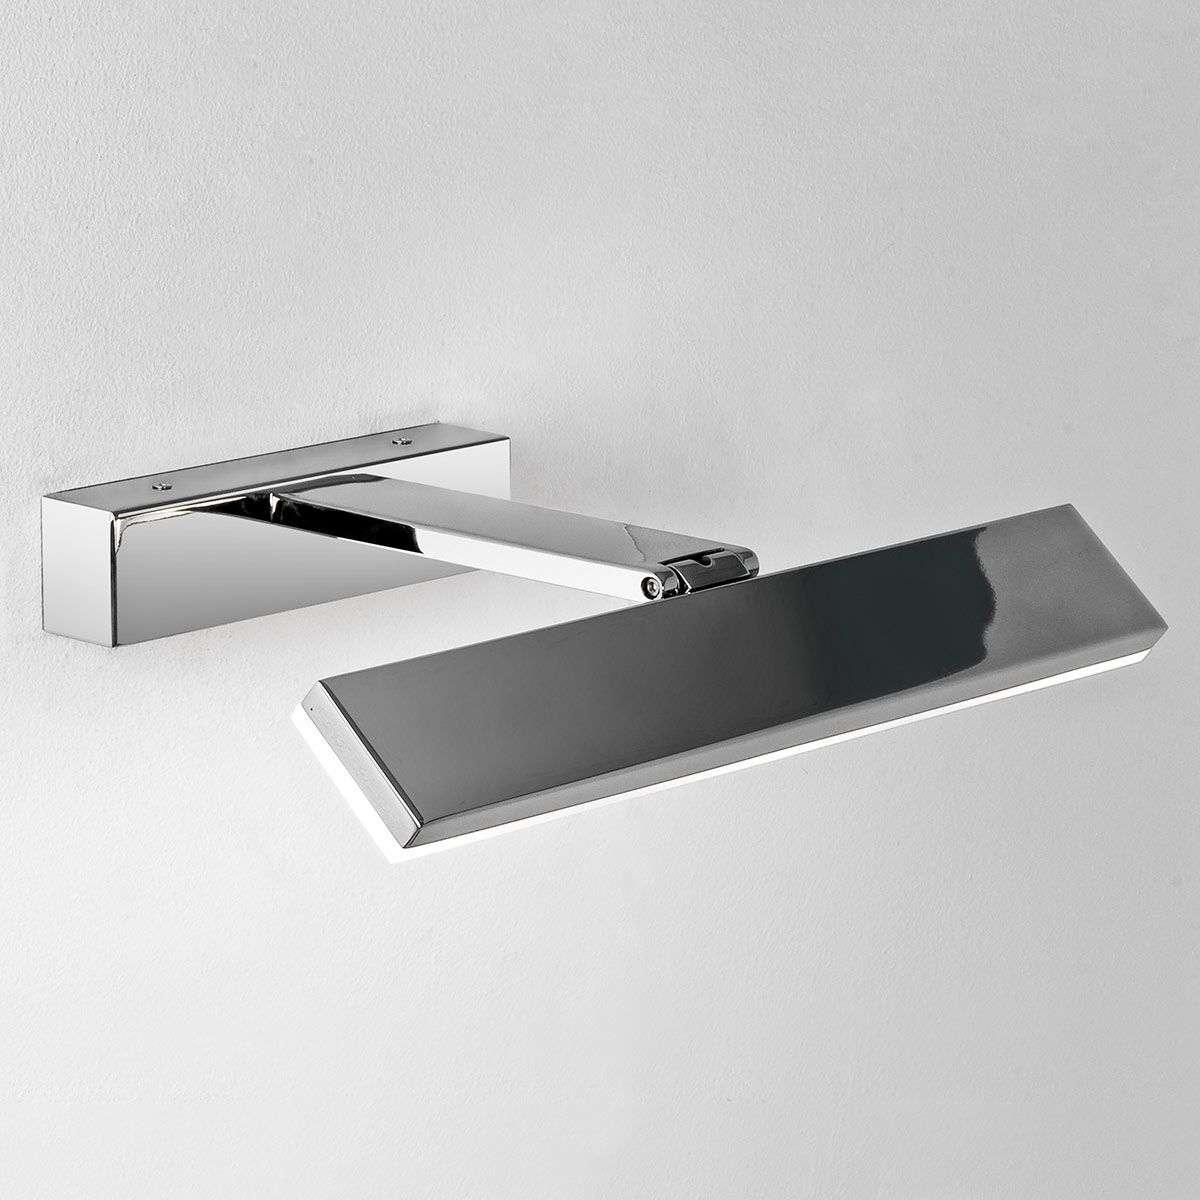 Zip LED Wall Light Innovative-1020386-33